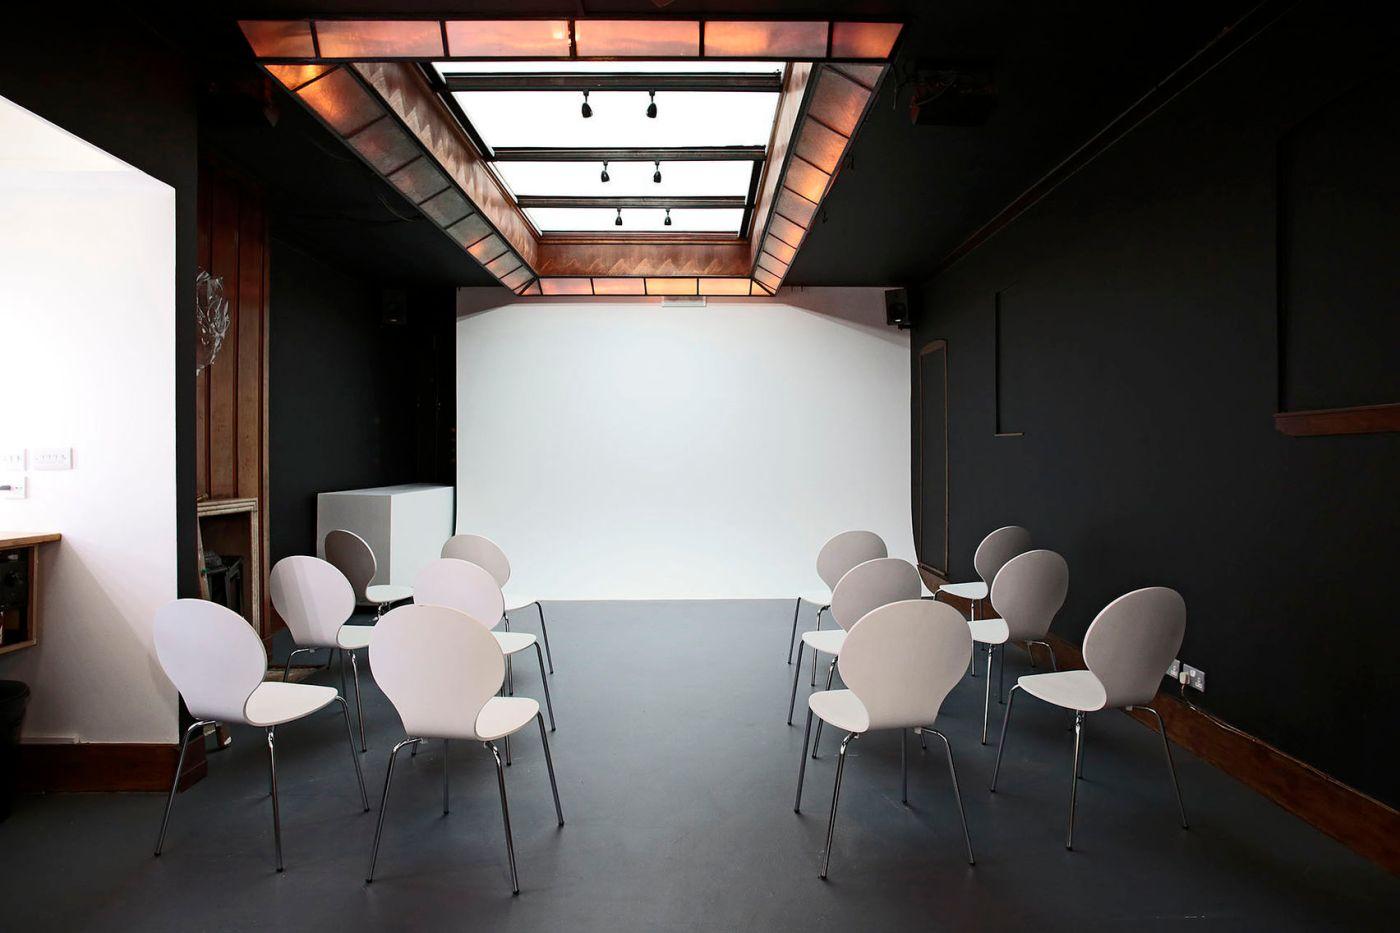 anomalous photography studio with white backdrop